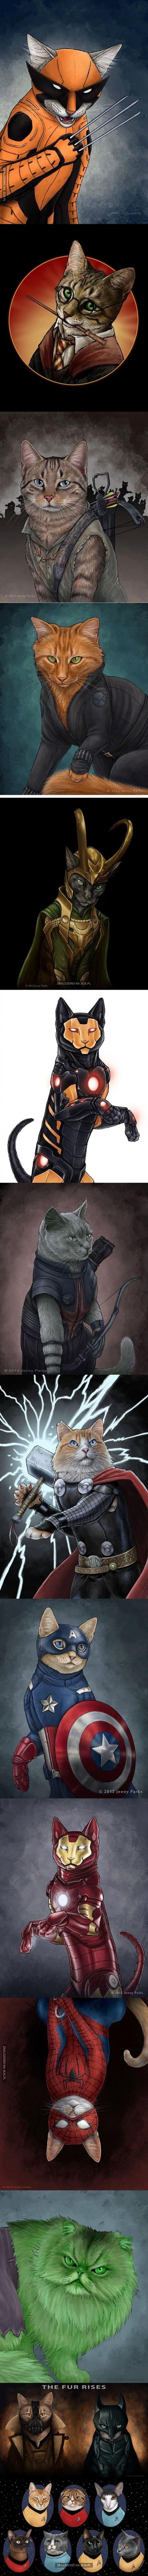 Gdyby popularne postaci były kotami